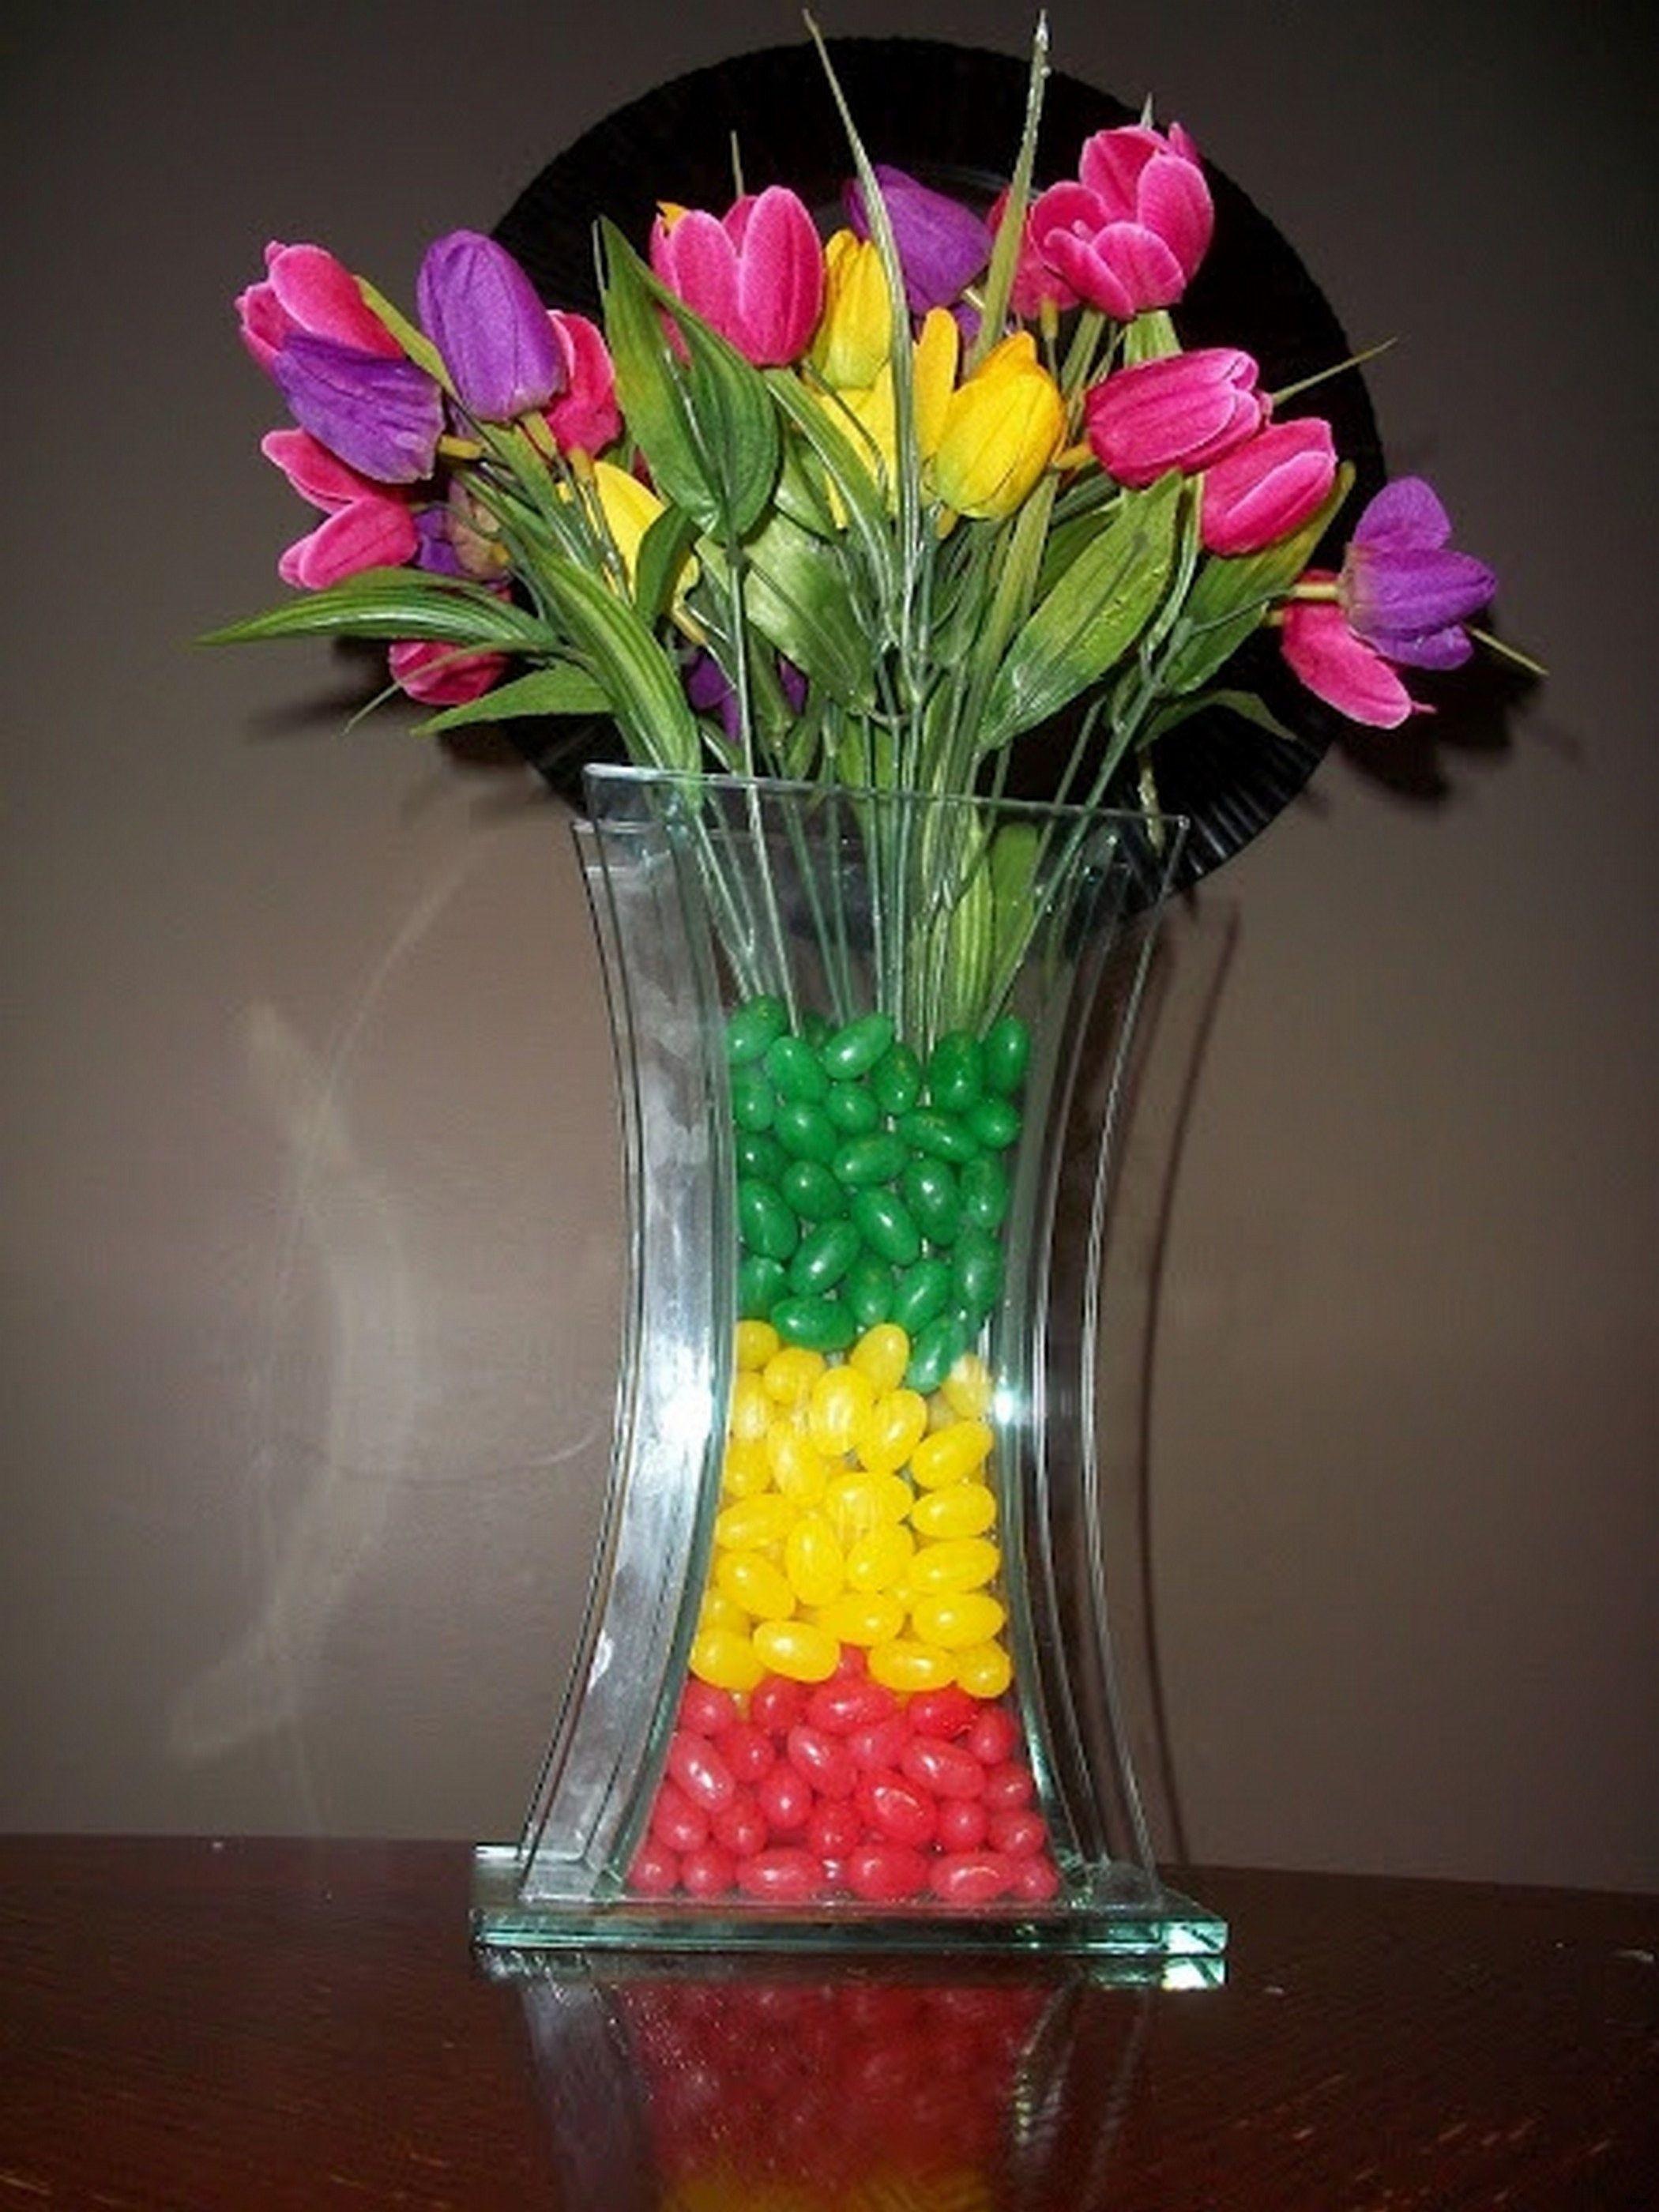 diy concrete vase of 50 tall vase fillers the weekly world intended for 15 cheap and easy diy vase filler ideas 3h vases flower i 0d scheme